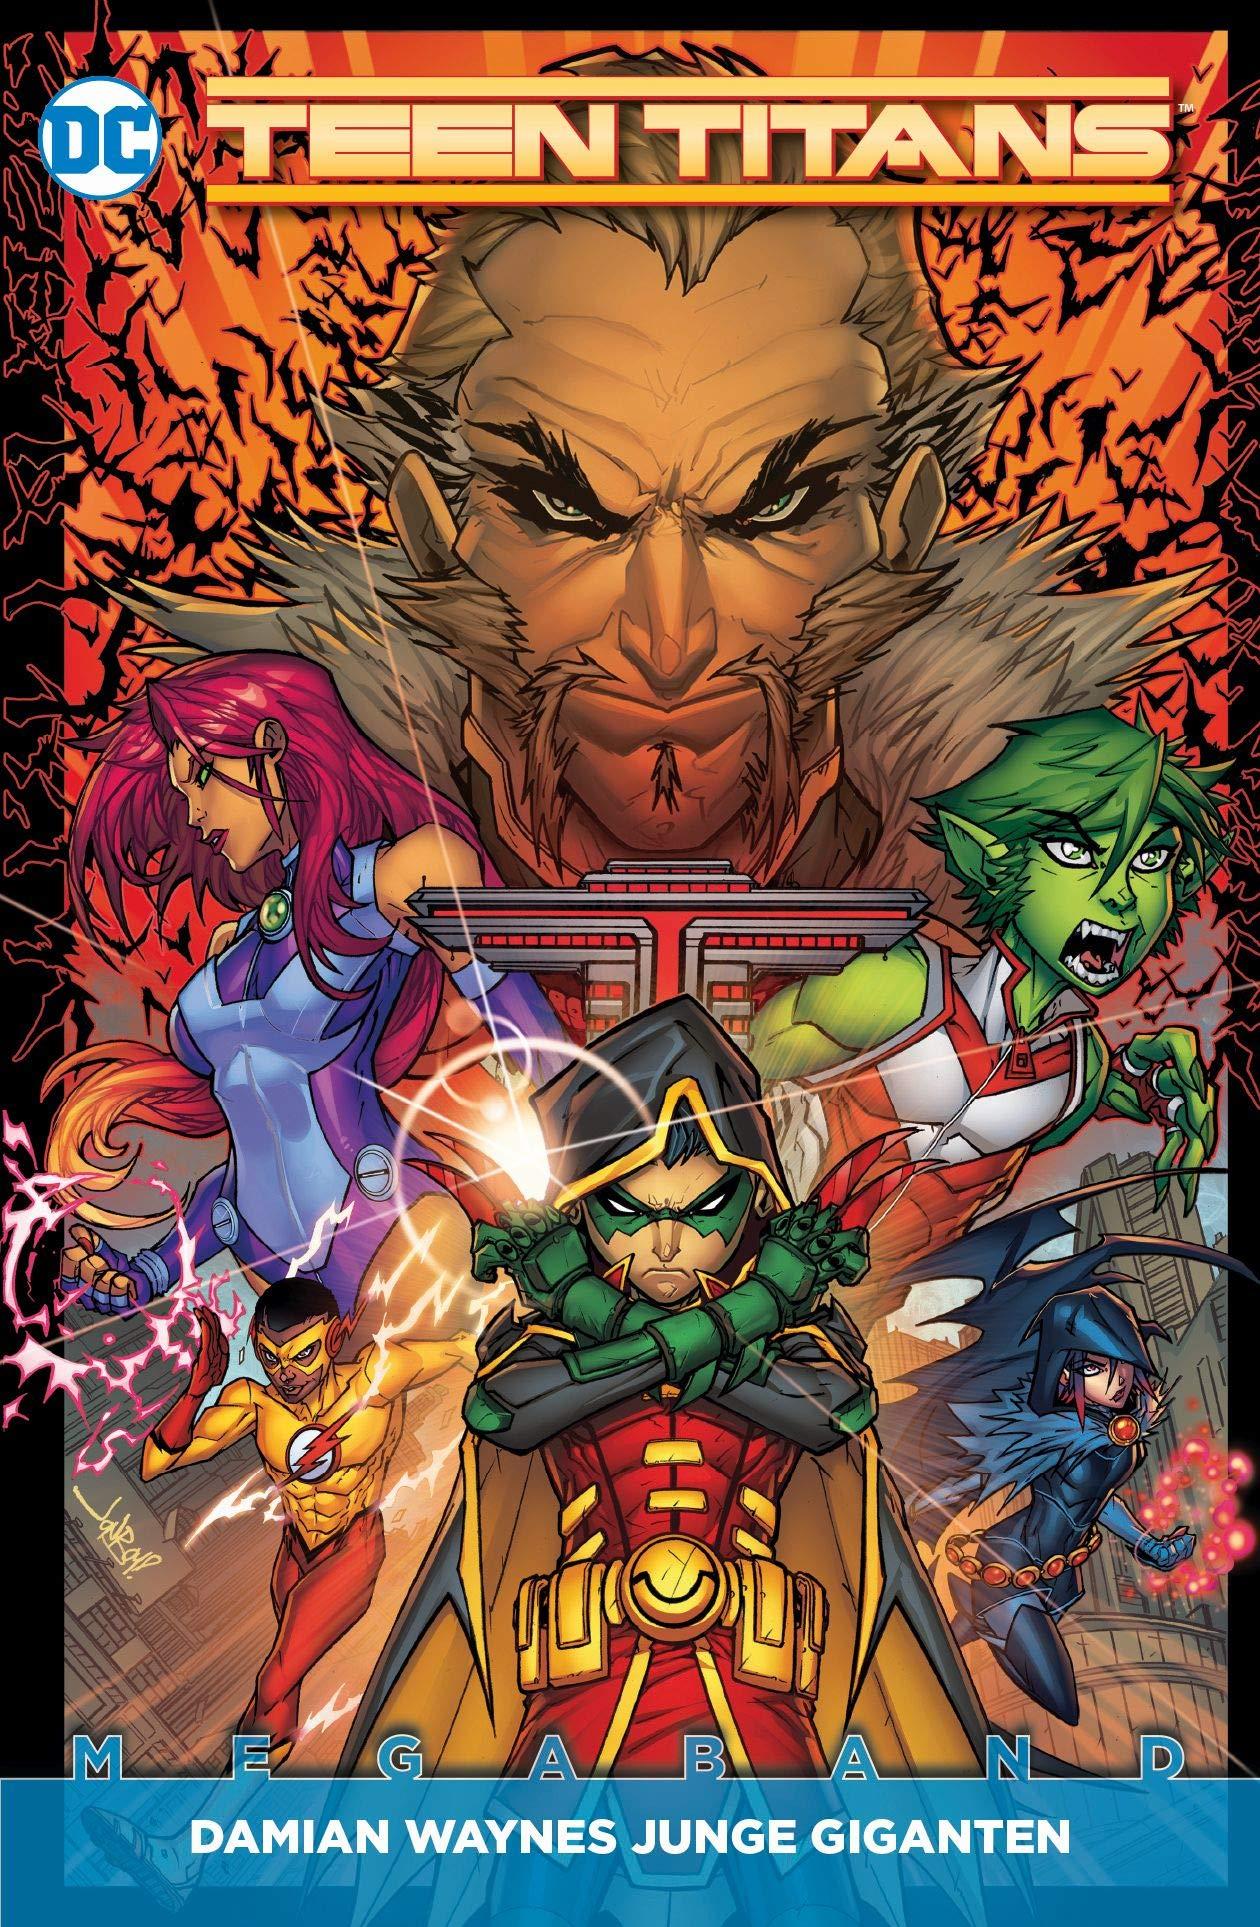 Teen Titans Megaband: Bd. 1 (2. Serie): Damian Waynes Junge Giganten Taschenbuch – 27. August 2018 Benjamin Percy Diogenes Neves Khoi Pham Jonboy Meyers